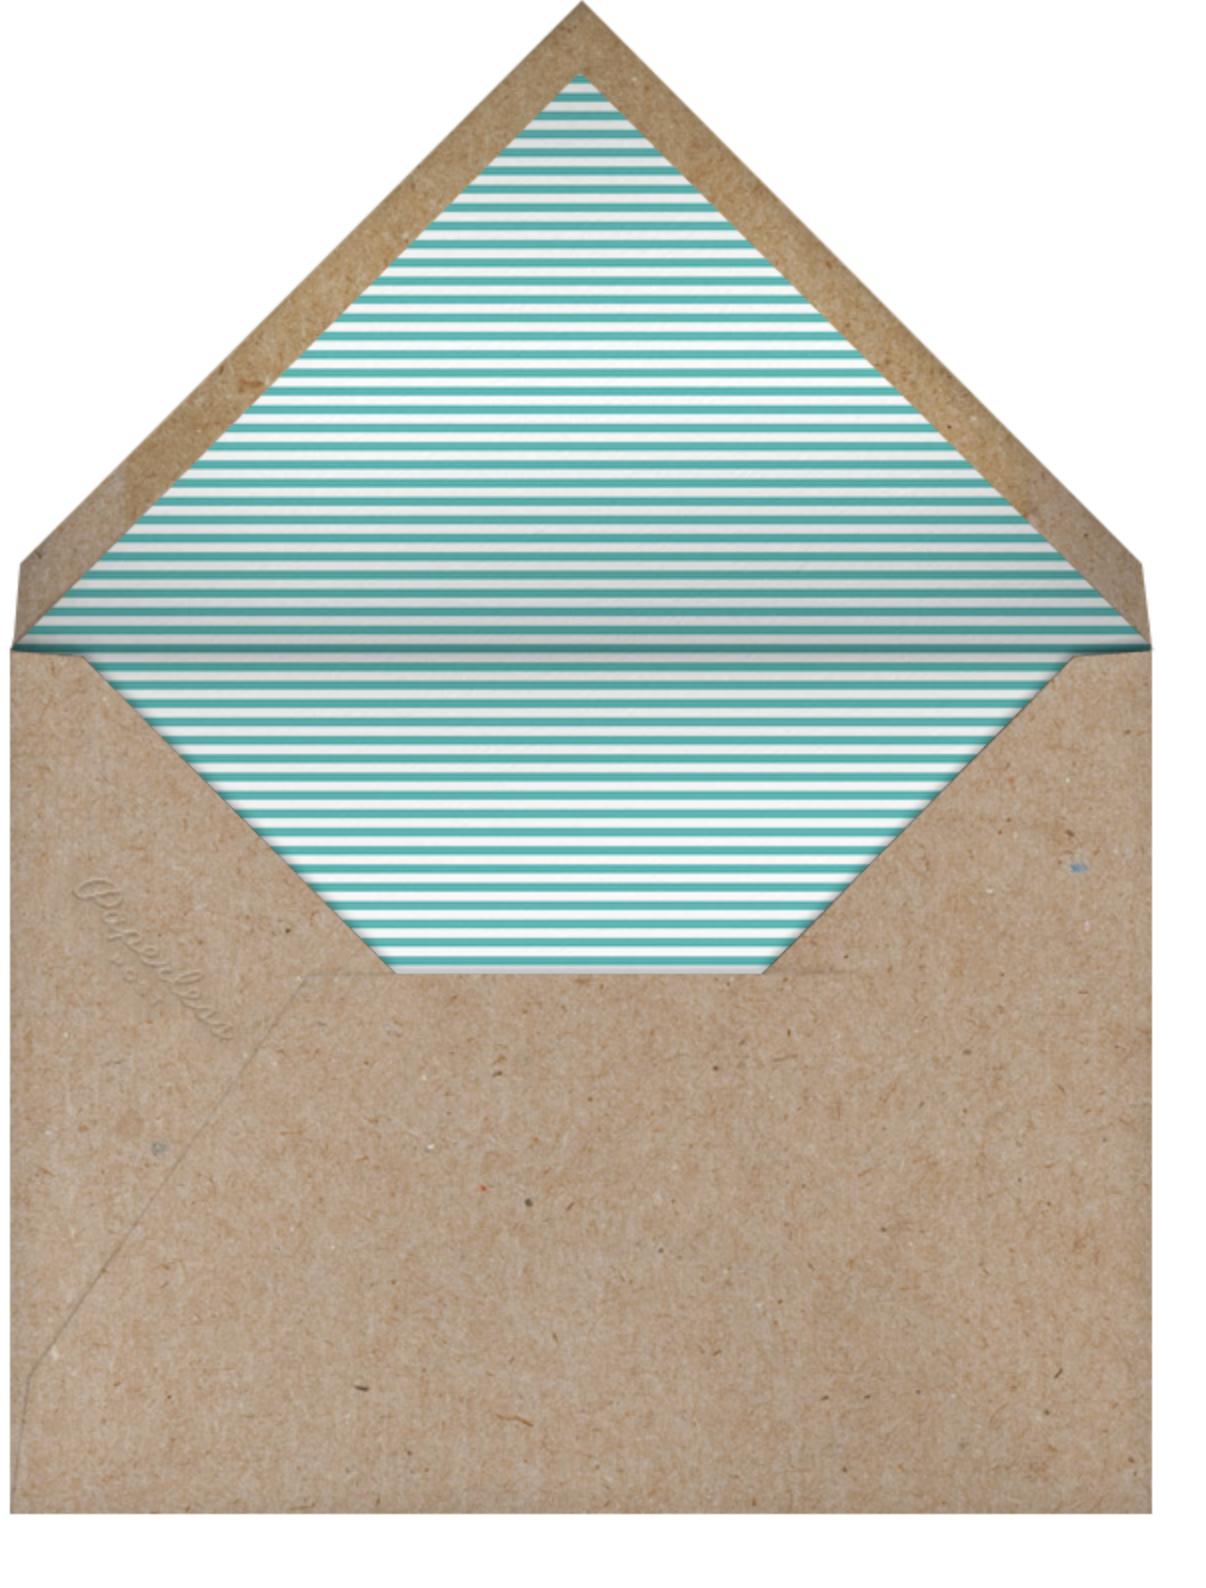 Forest Parade (Double-sided) - Woodgrain - Petit Collage - Woodland baby shower - envelope back